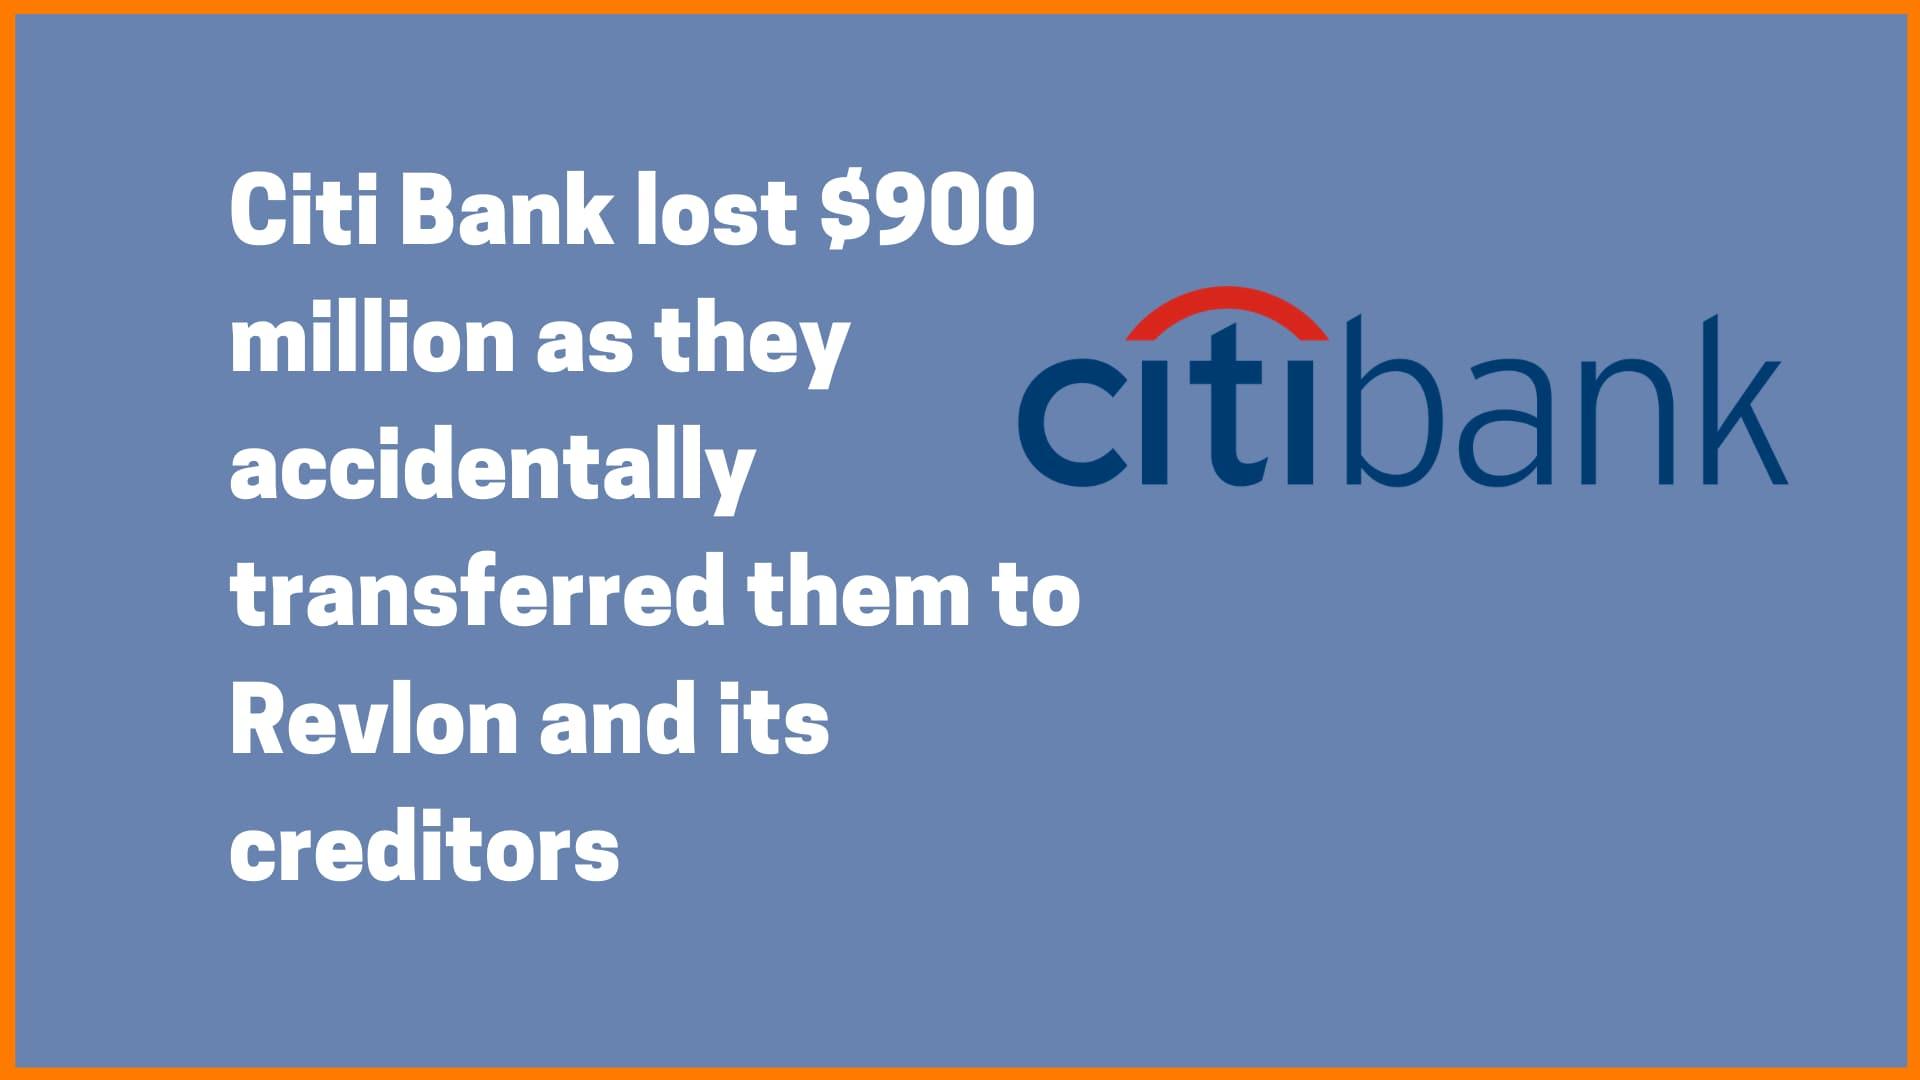 Citibank lost $900 million